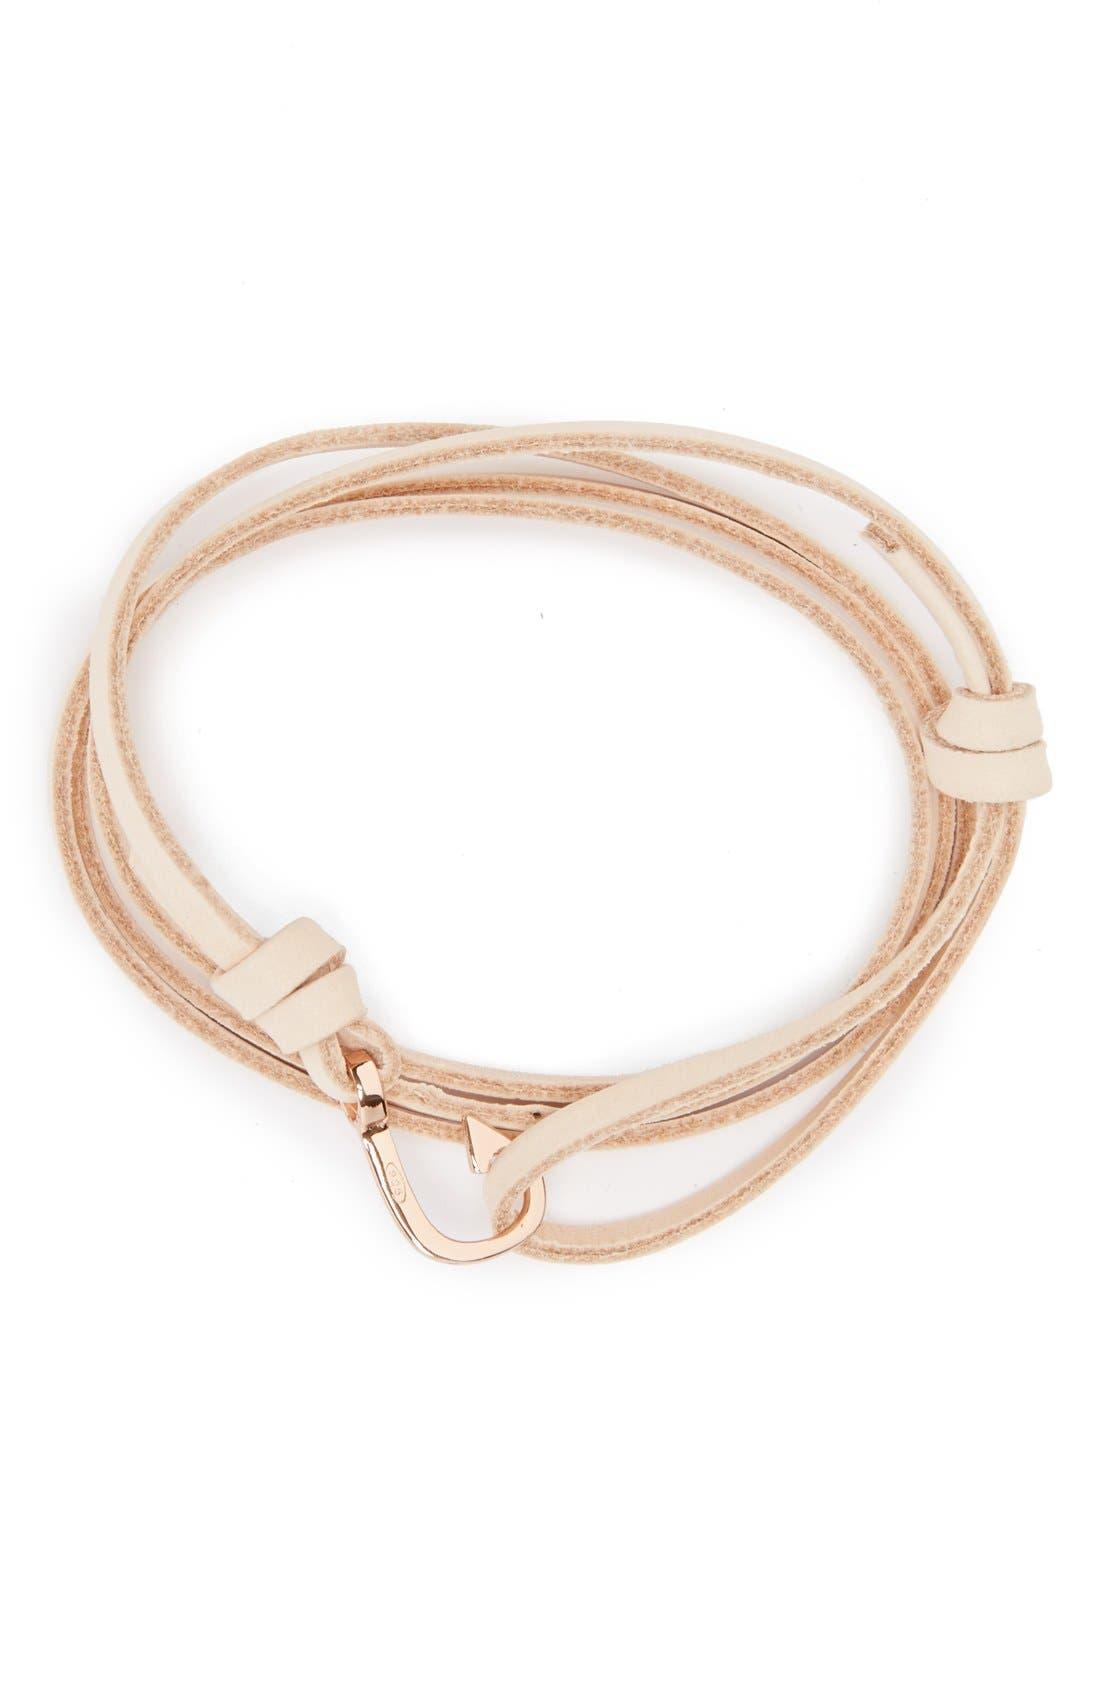 Main Image - Miansai Rose Gold Mini Hook Leather Bracelet